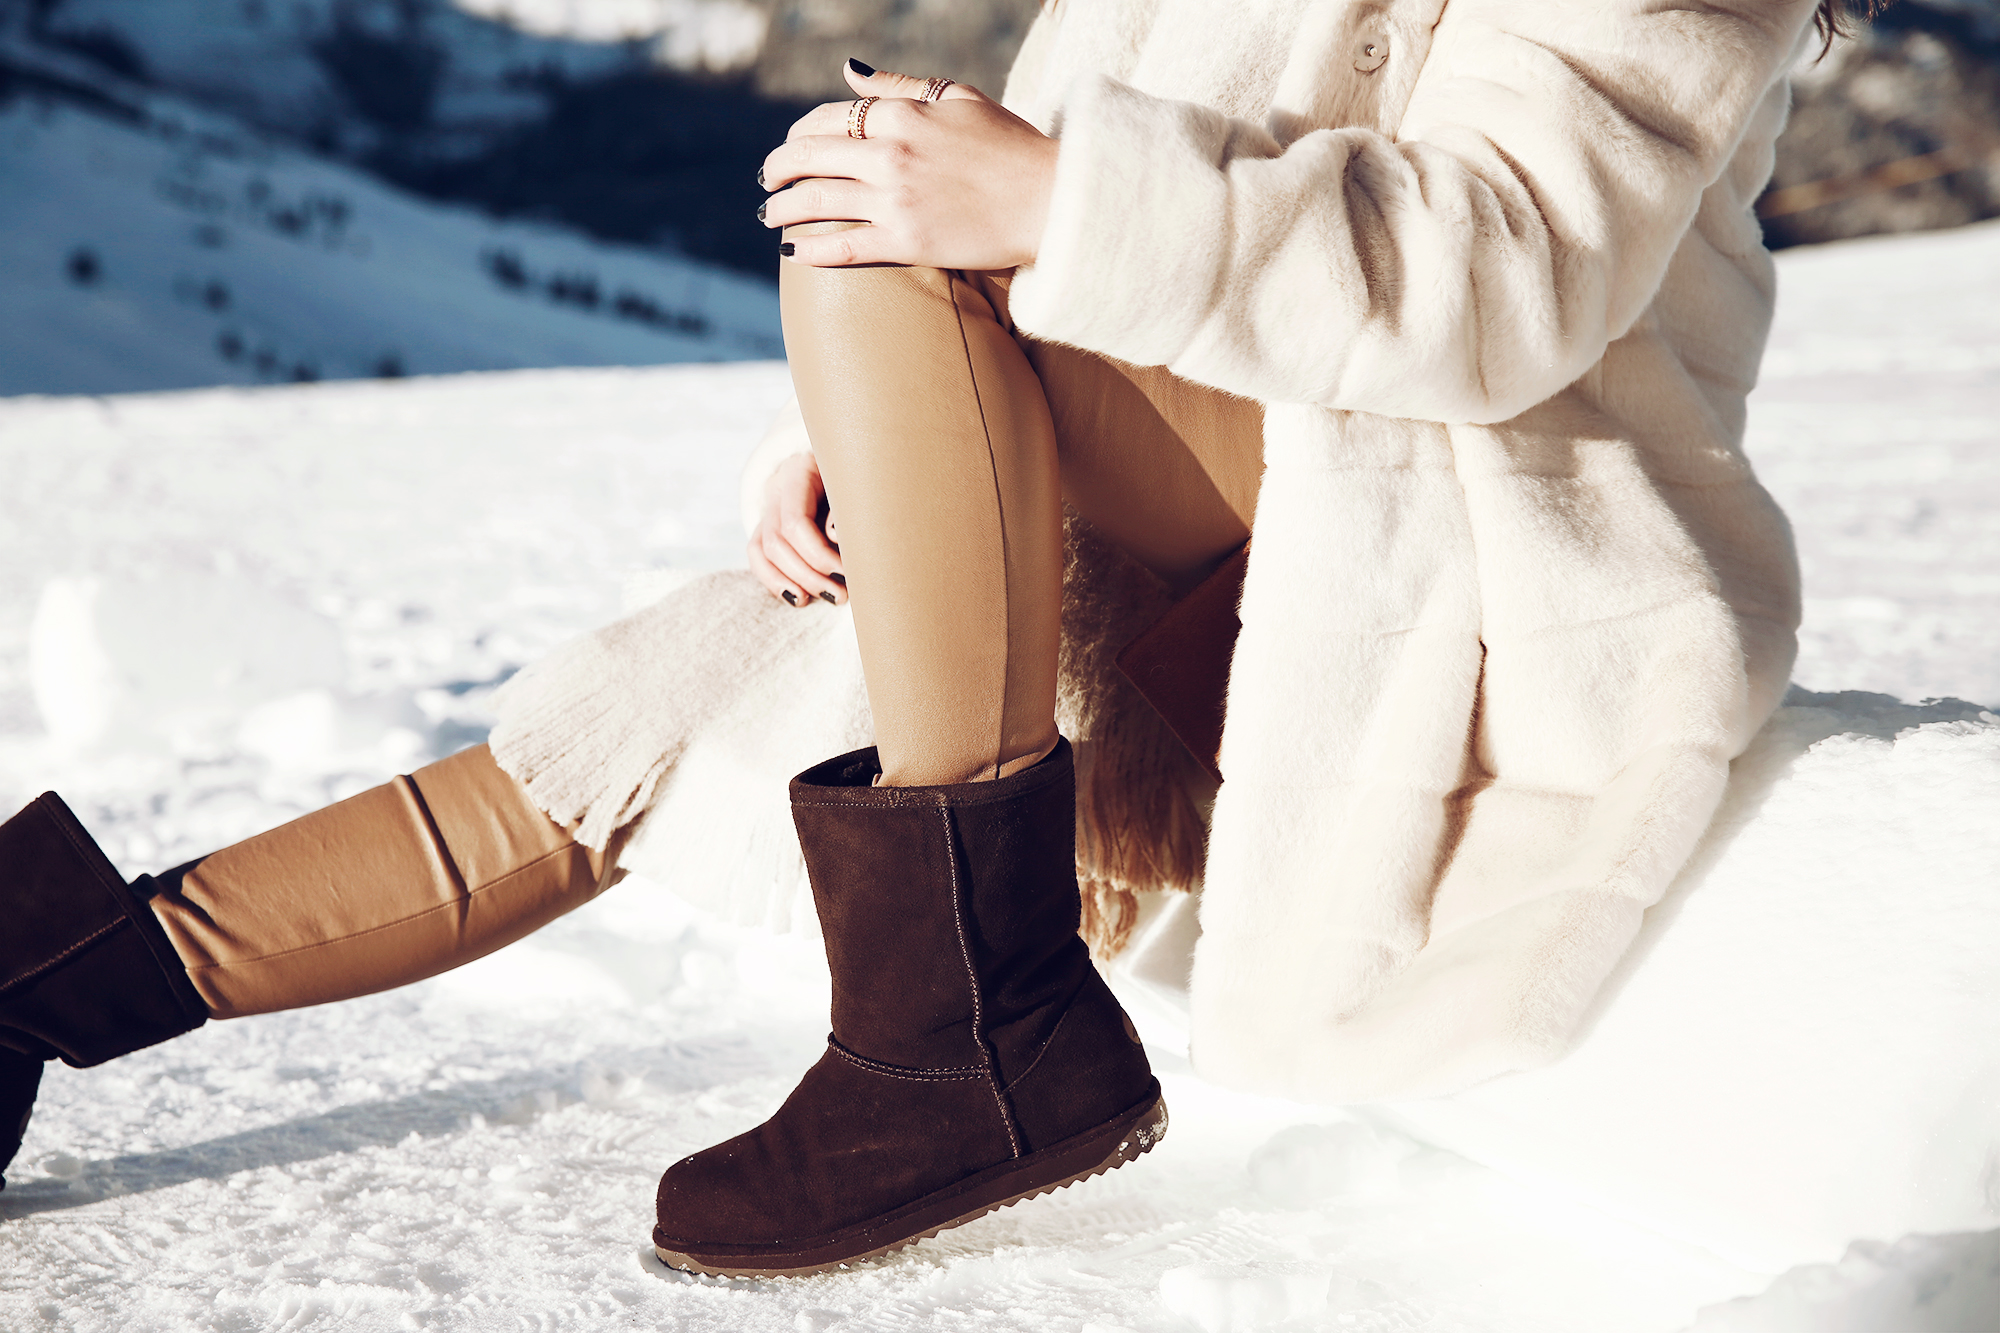 e1785693d4479 Obujte sa do zimy! | answear.sk blog